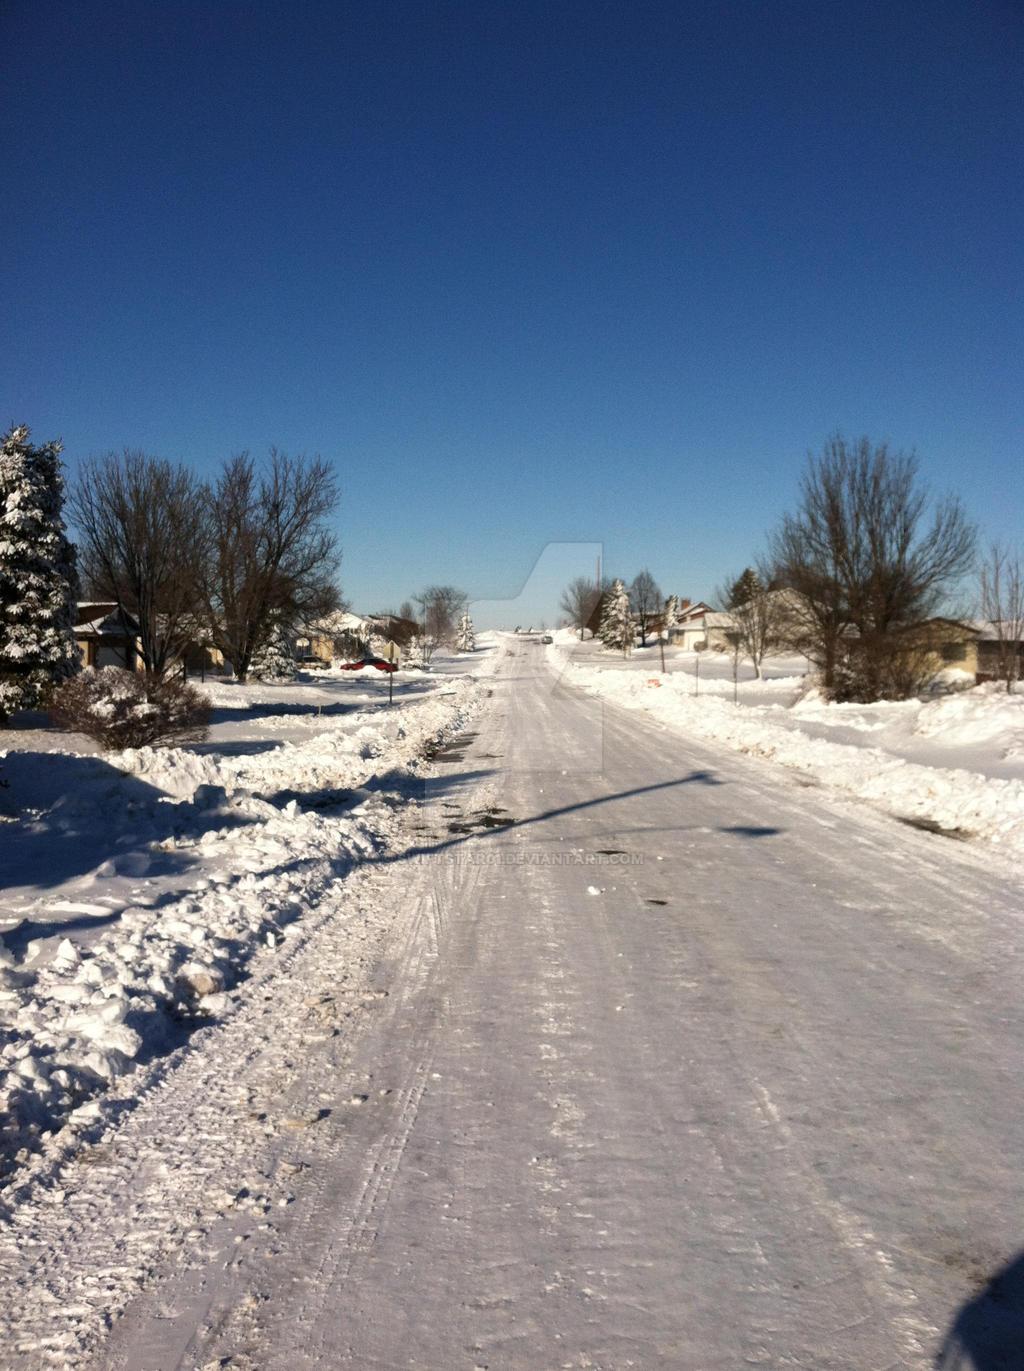 Winter in Collins by Swiftstar01